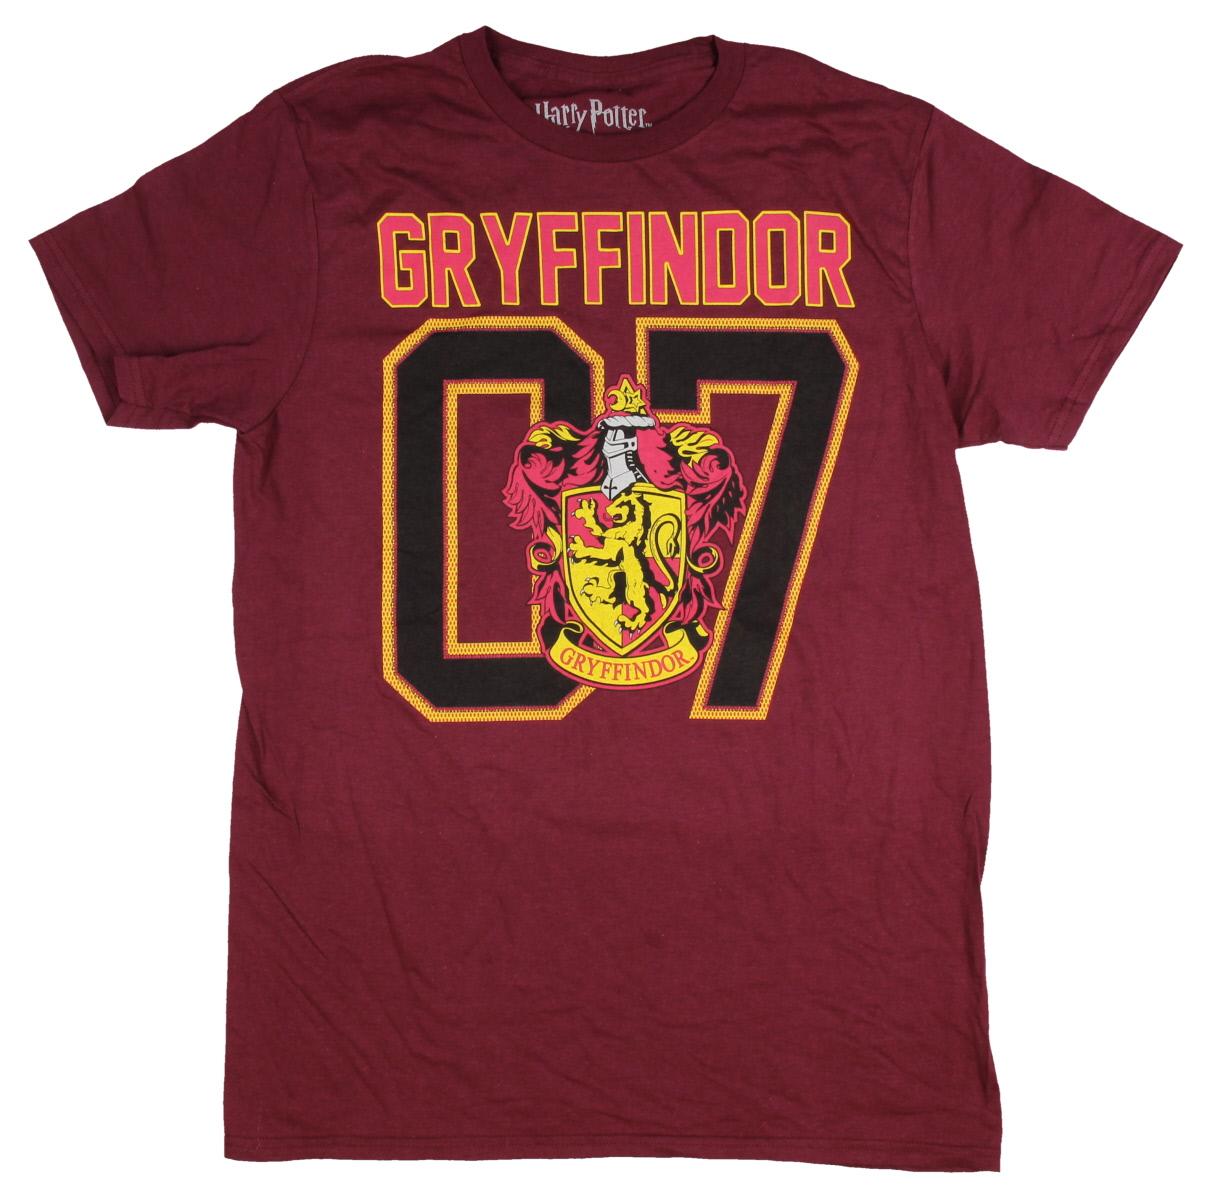 Harry Potter Gryffindor Shirt Men's House Lion Crest 07 Quidditch T-shirt